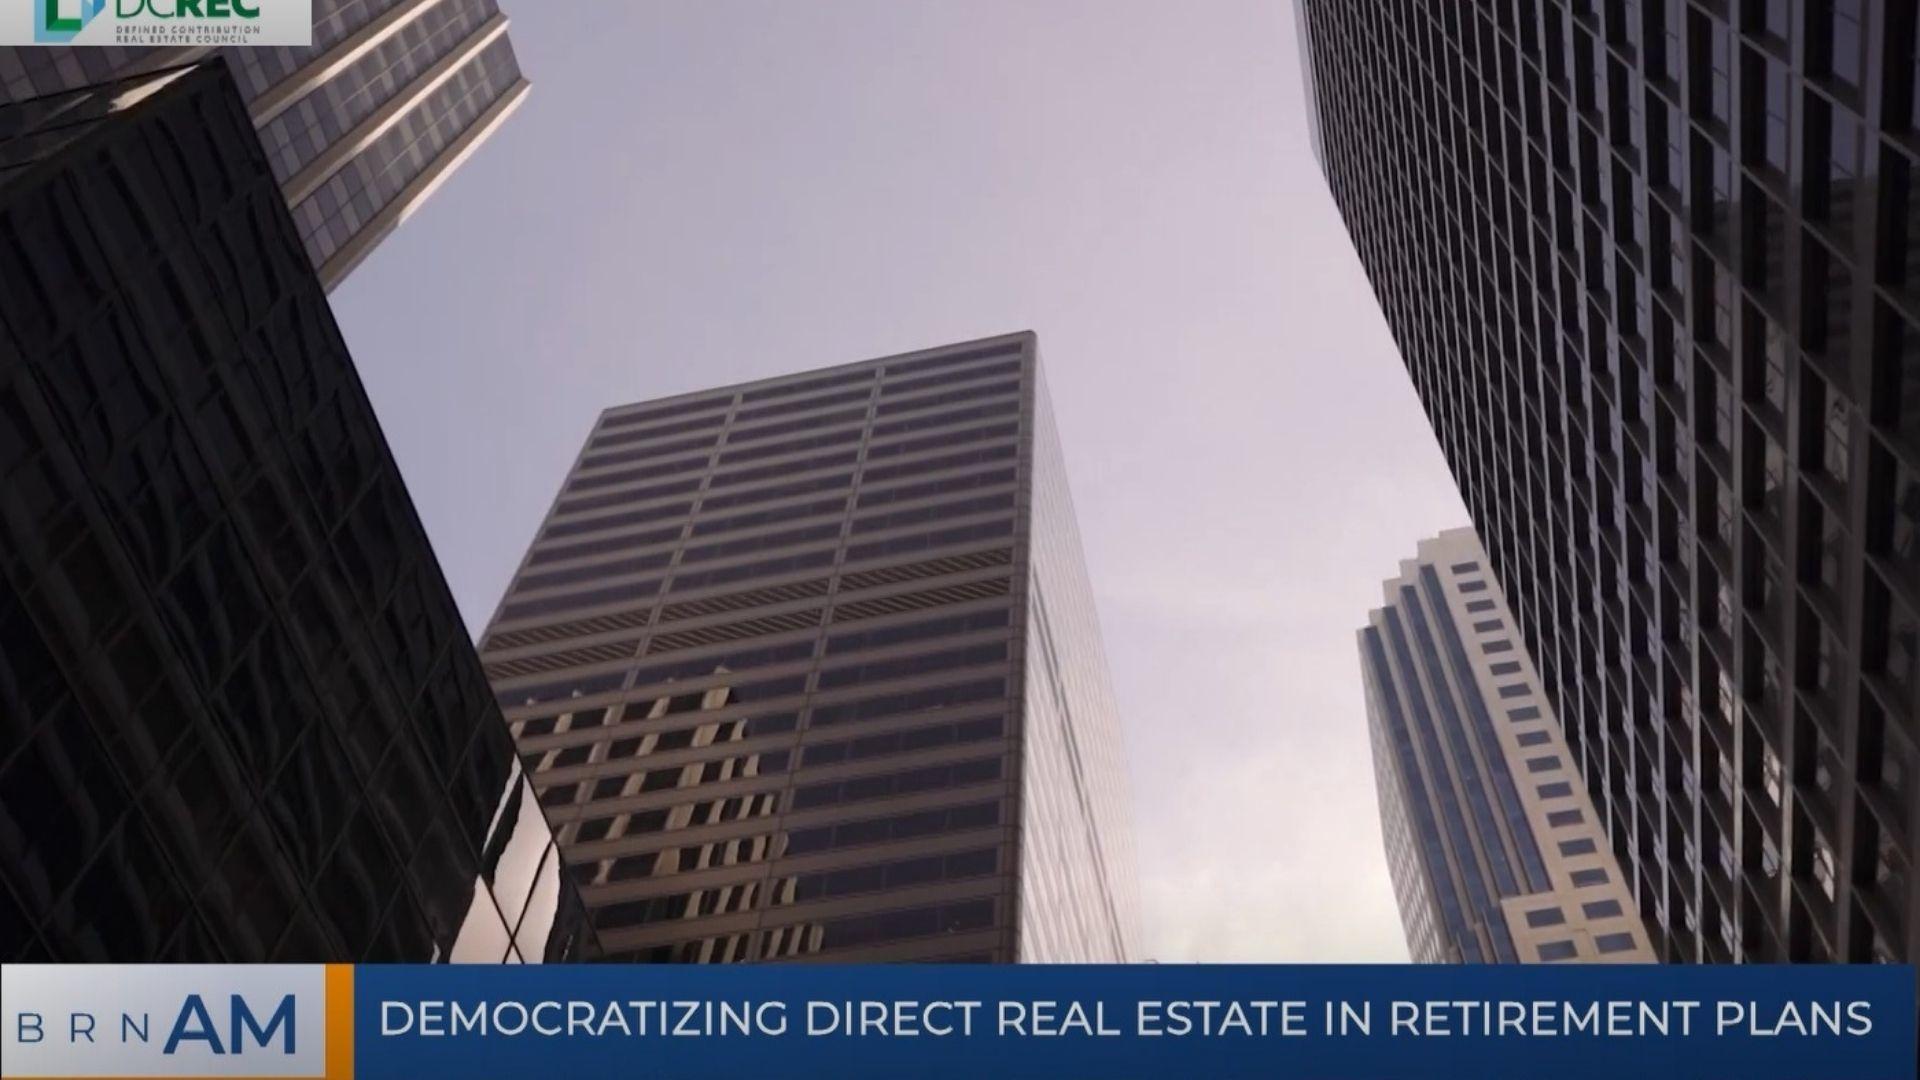 BRN AM   Democratizing direct real estate in retirement plans & Evolving liquidity landscape